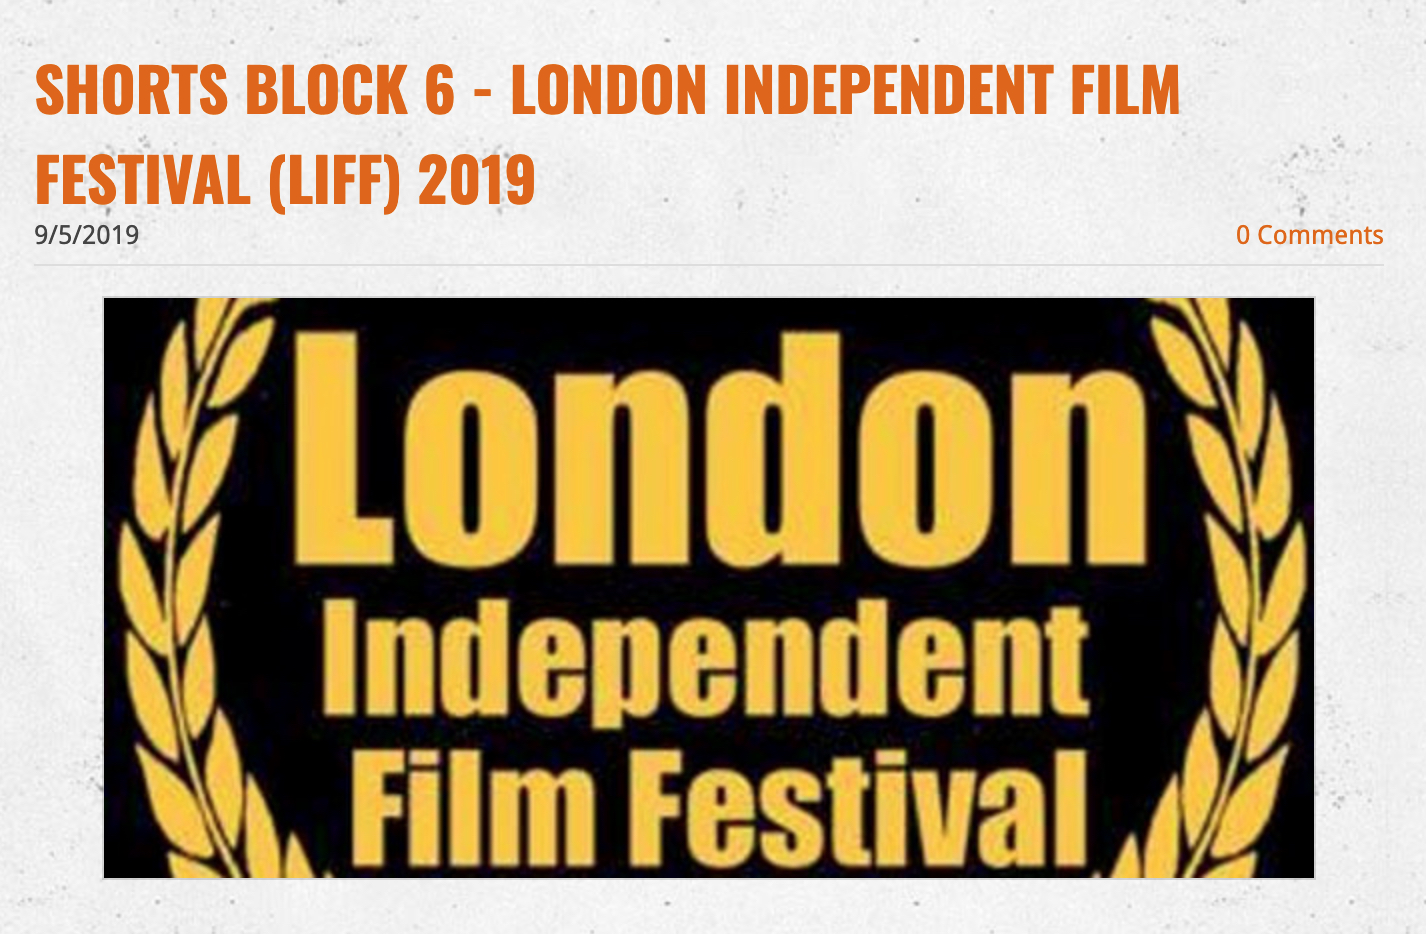 Read more:  actinghour.com/reviews/shorts-block-6-london-independent-film-festival-liff-2019